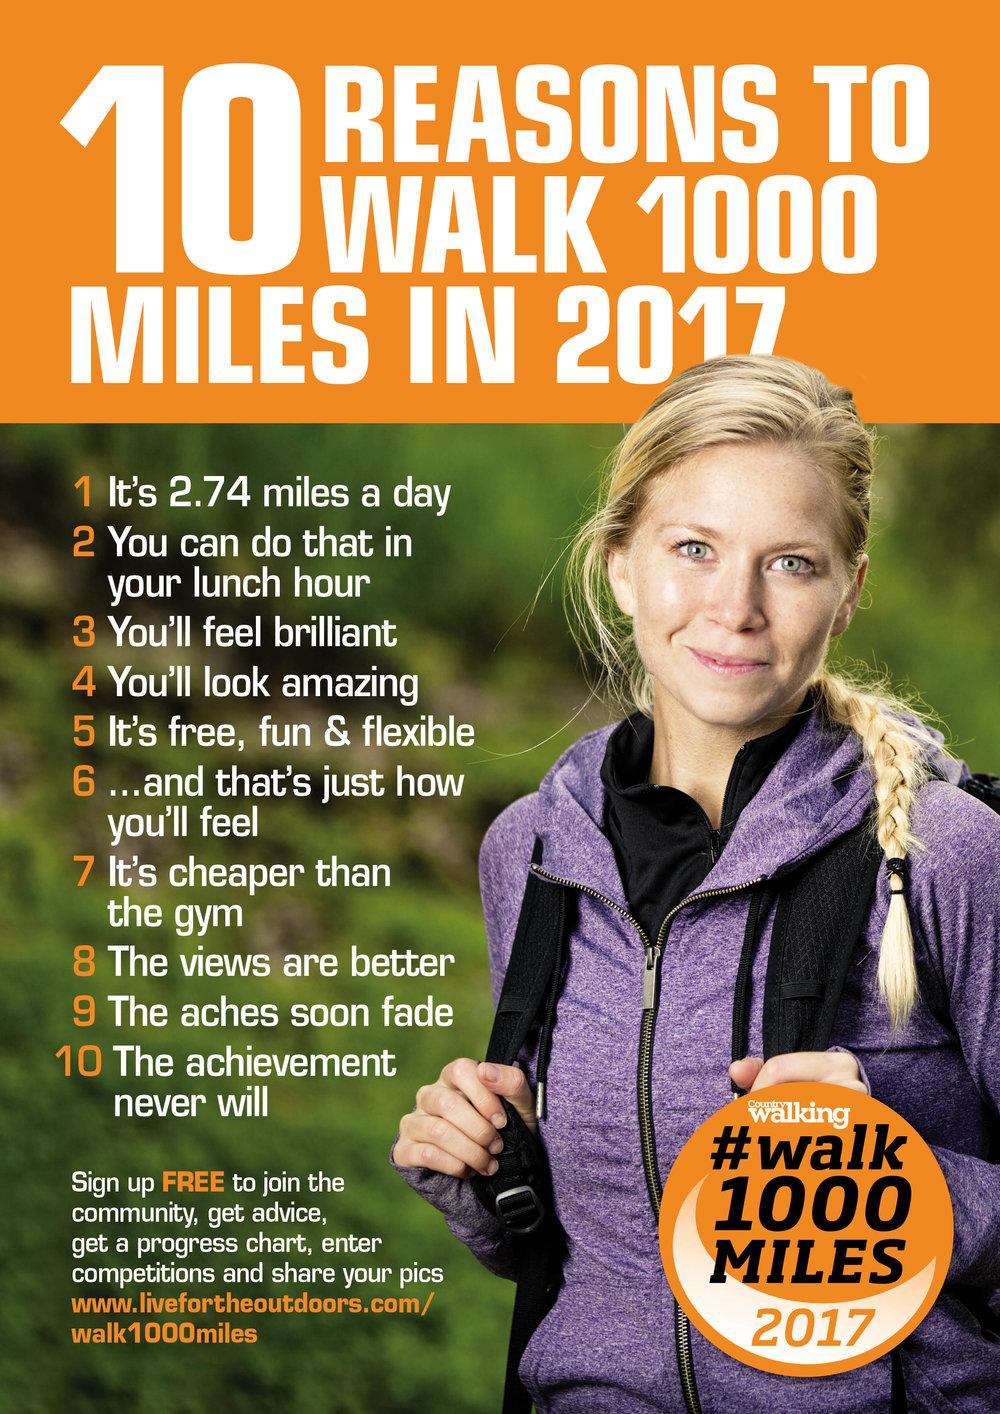 #walk1000miles 2017 poster6.jpg